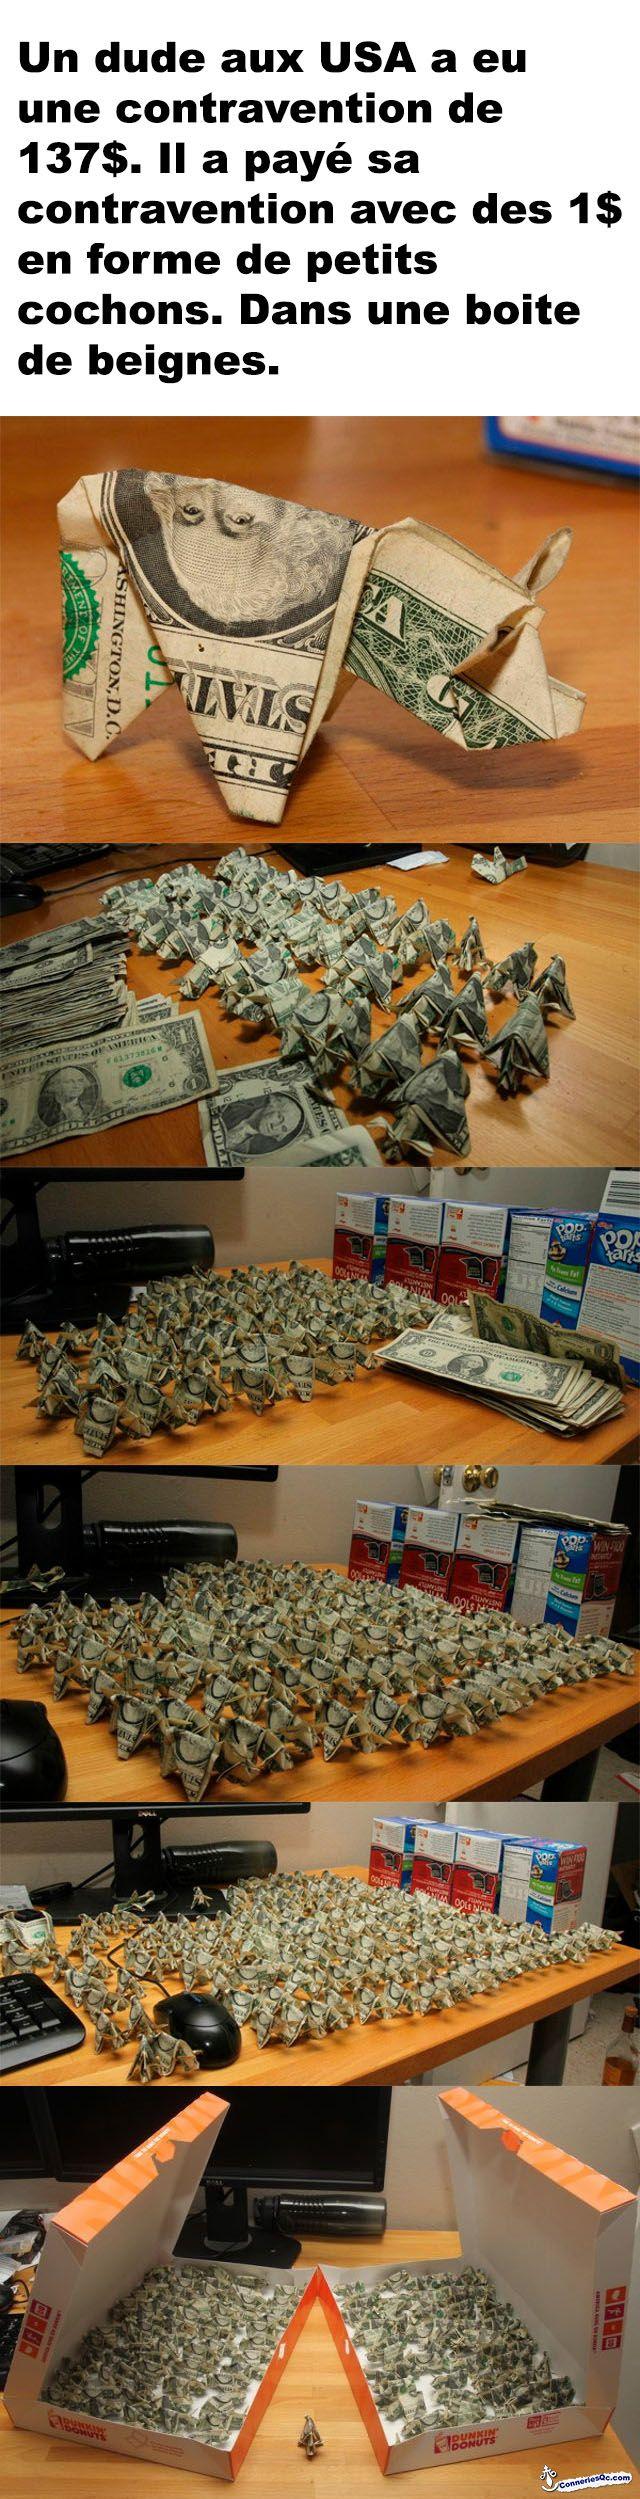 Payer sa contravention